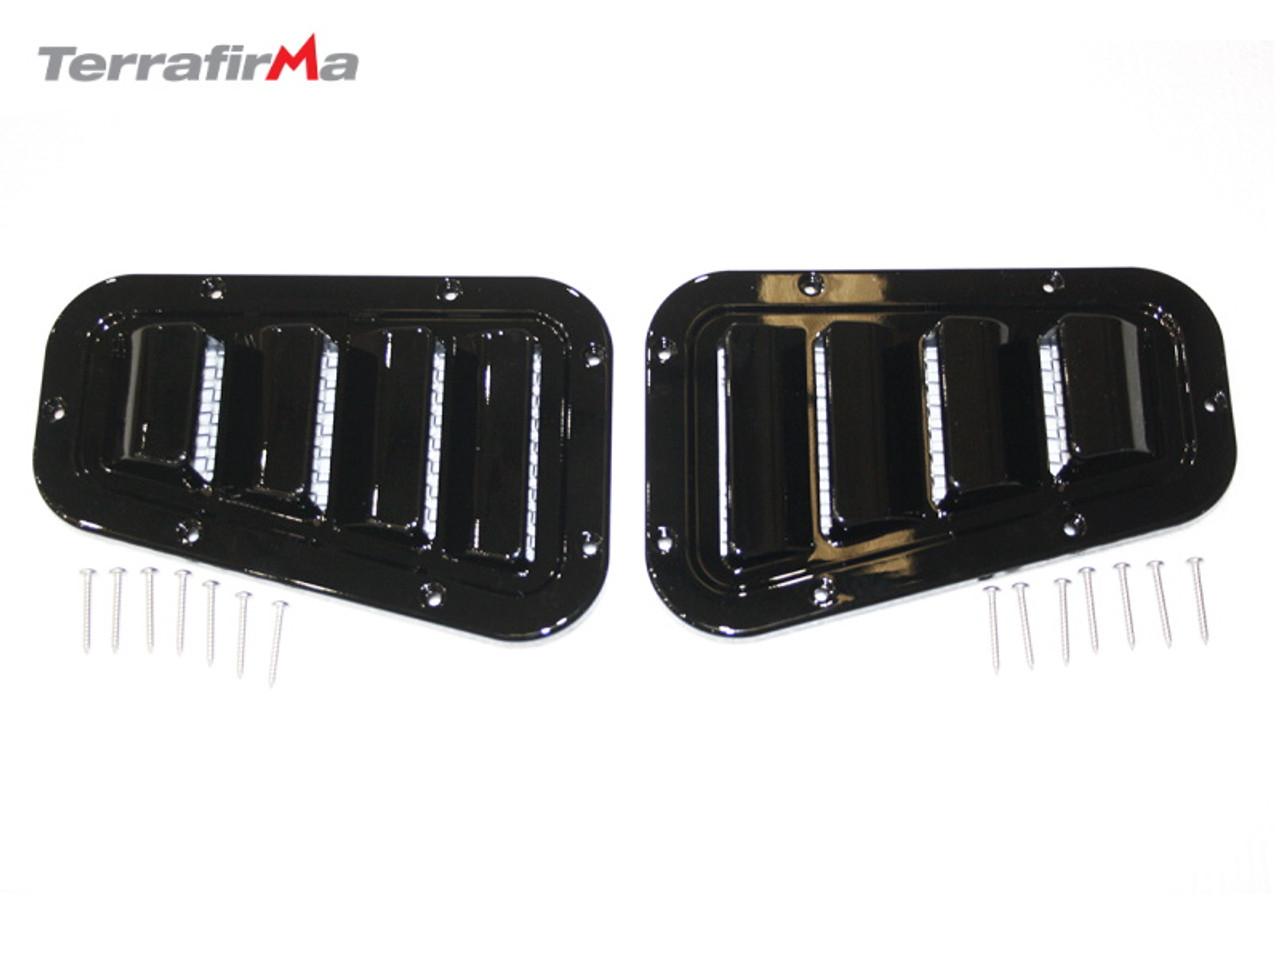 Terrafirma Sport Gloss Black Wing Top Grills For Defender 90/110/130 - TF272GF